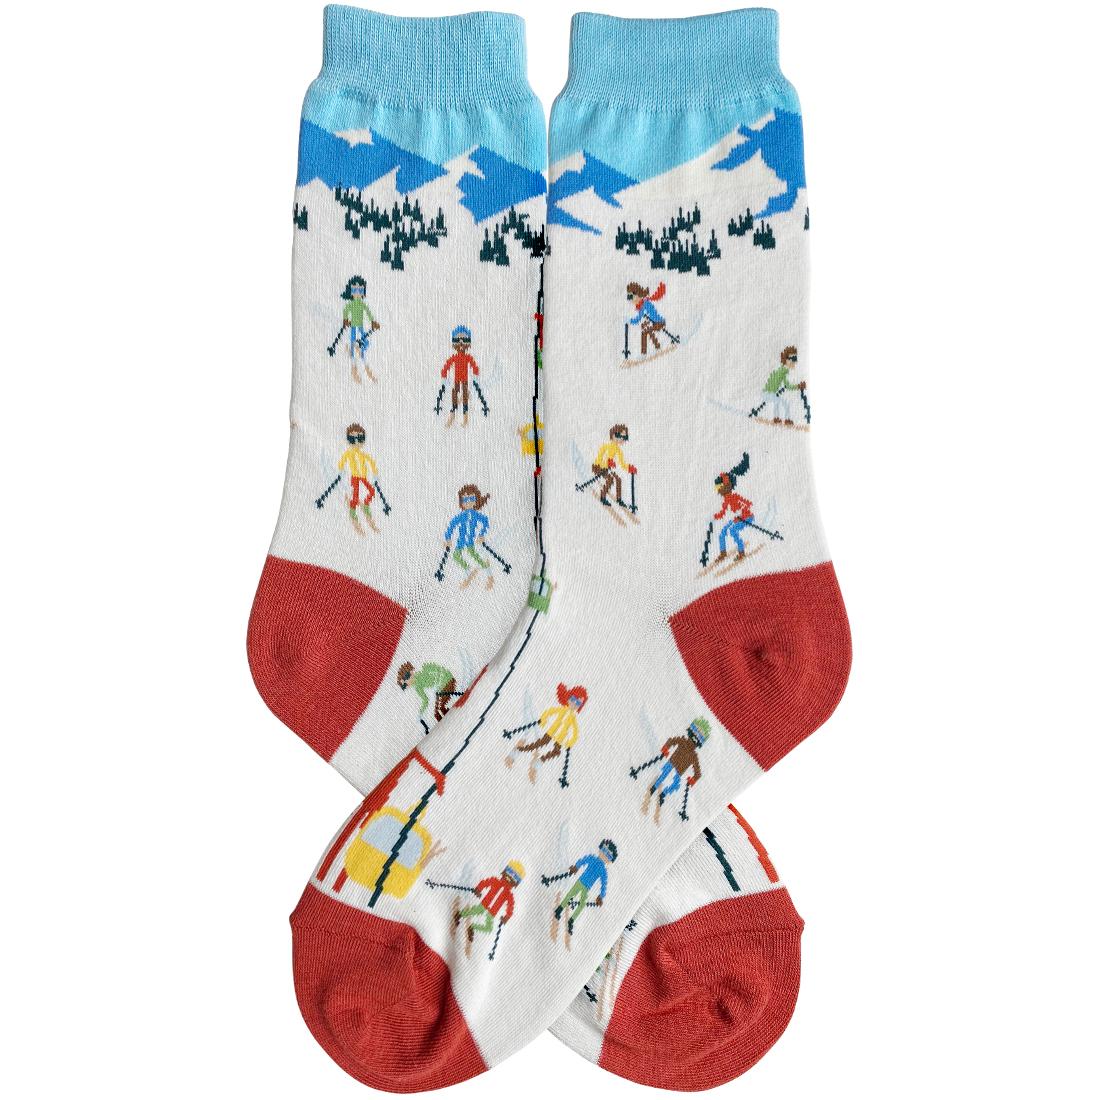 Skiing Women's Socks